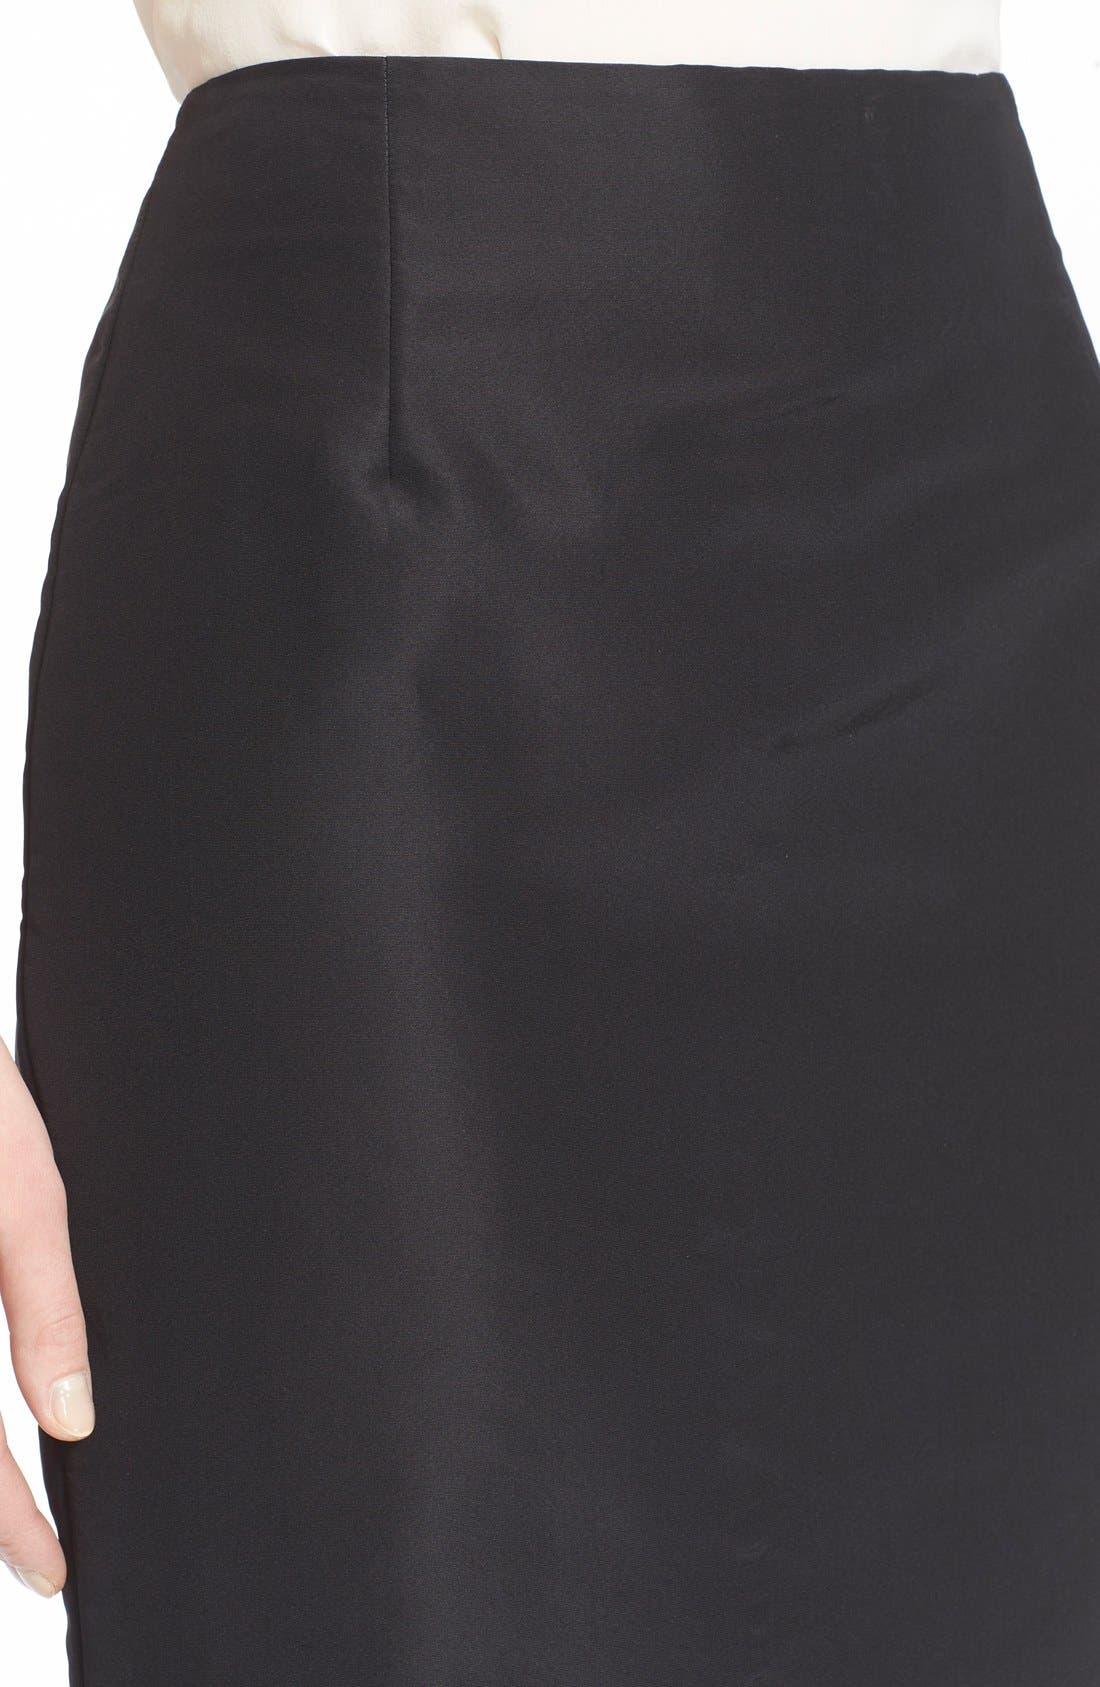 Silk Pencil Skirt,                             Alternate thumbnail 5, color,                             001